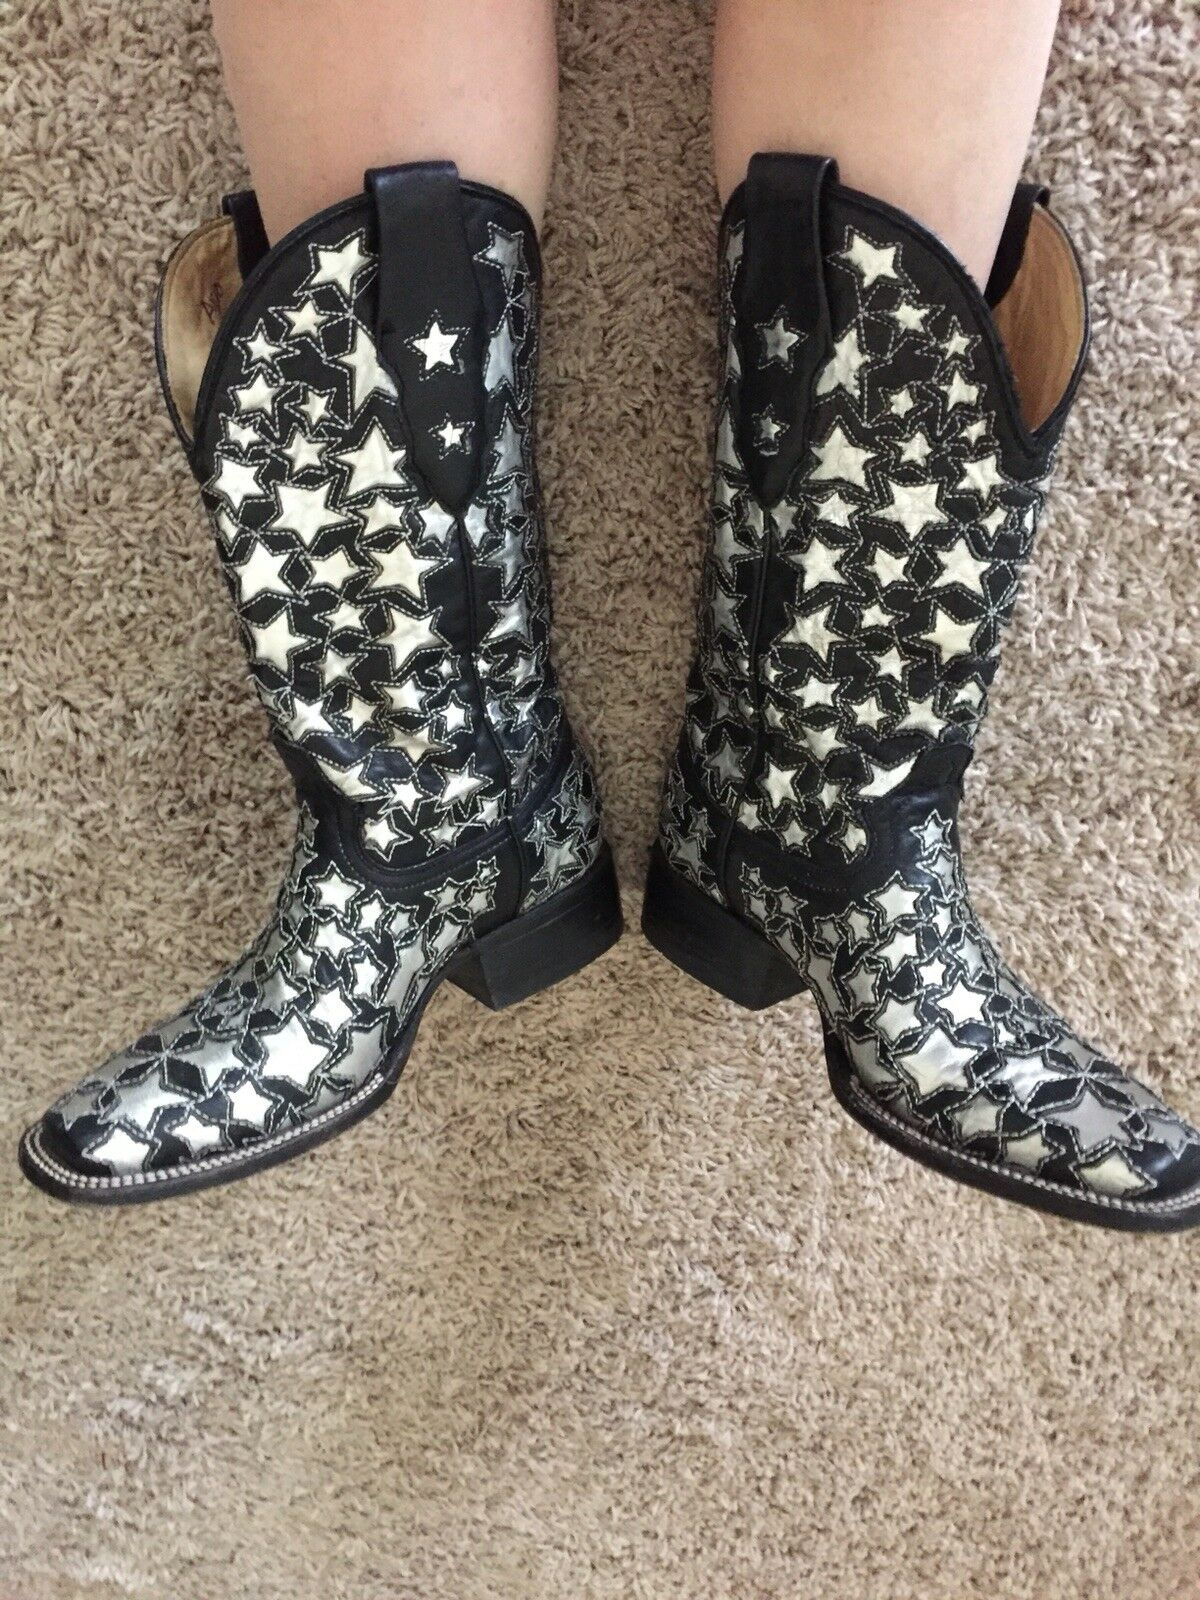 argent Star Glitter Corral Cowboy bottes bottes bottes Runway Stage Art Glam Rock Avant Garde b47208